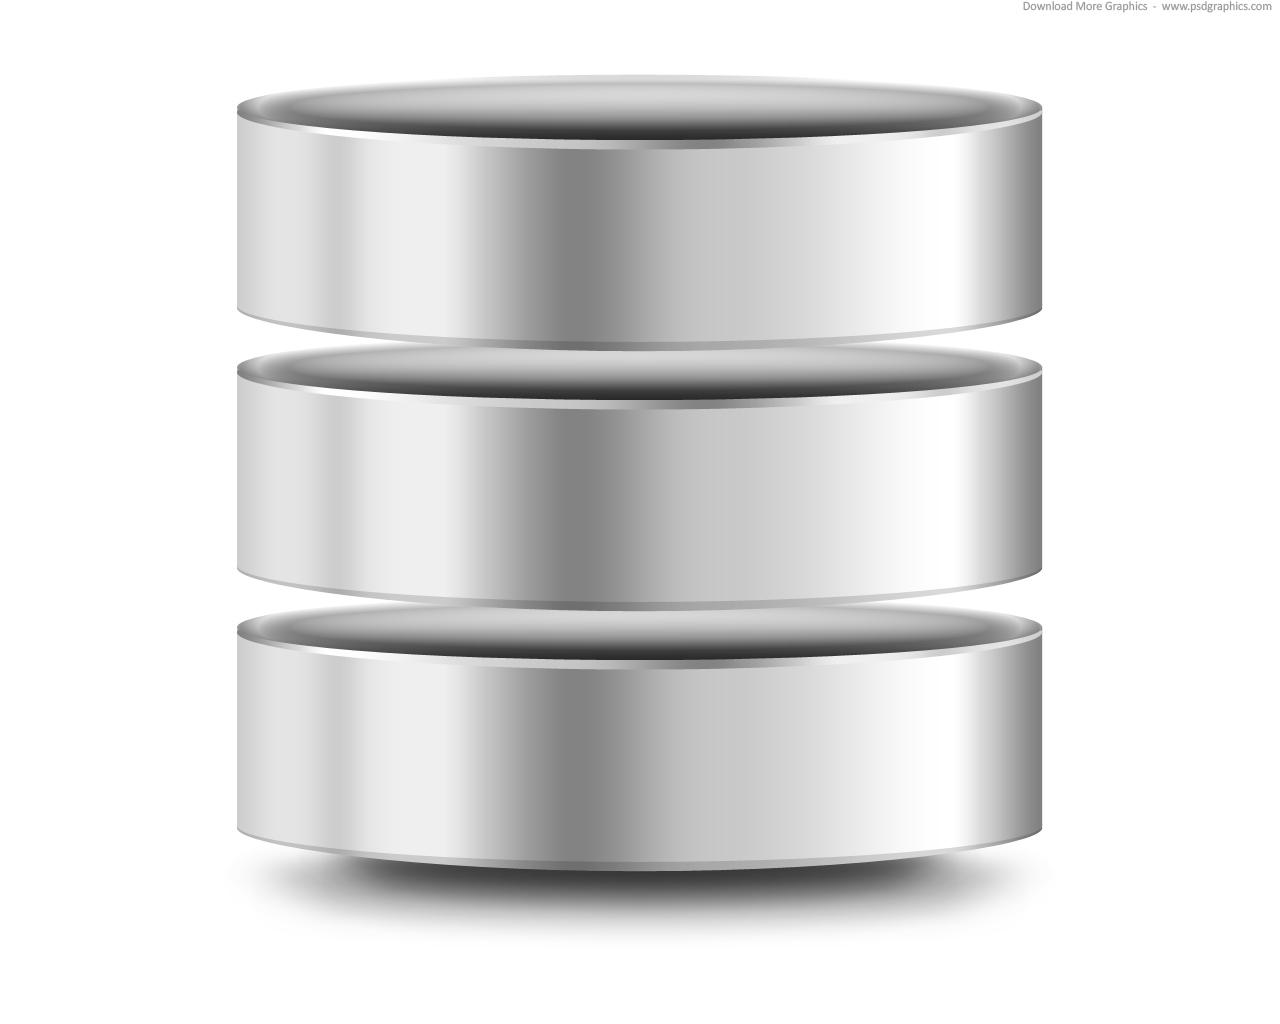 Storage disk clipart svg free Free Database Server Cliparts, Download Free Clip Art, Free ... svg free